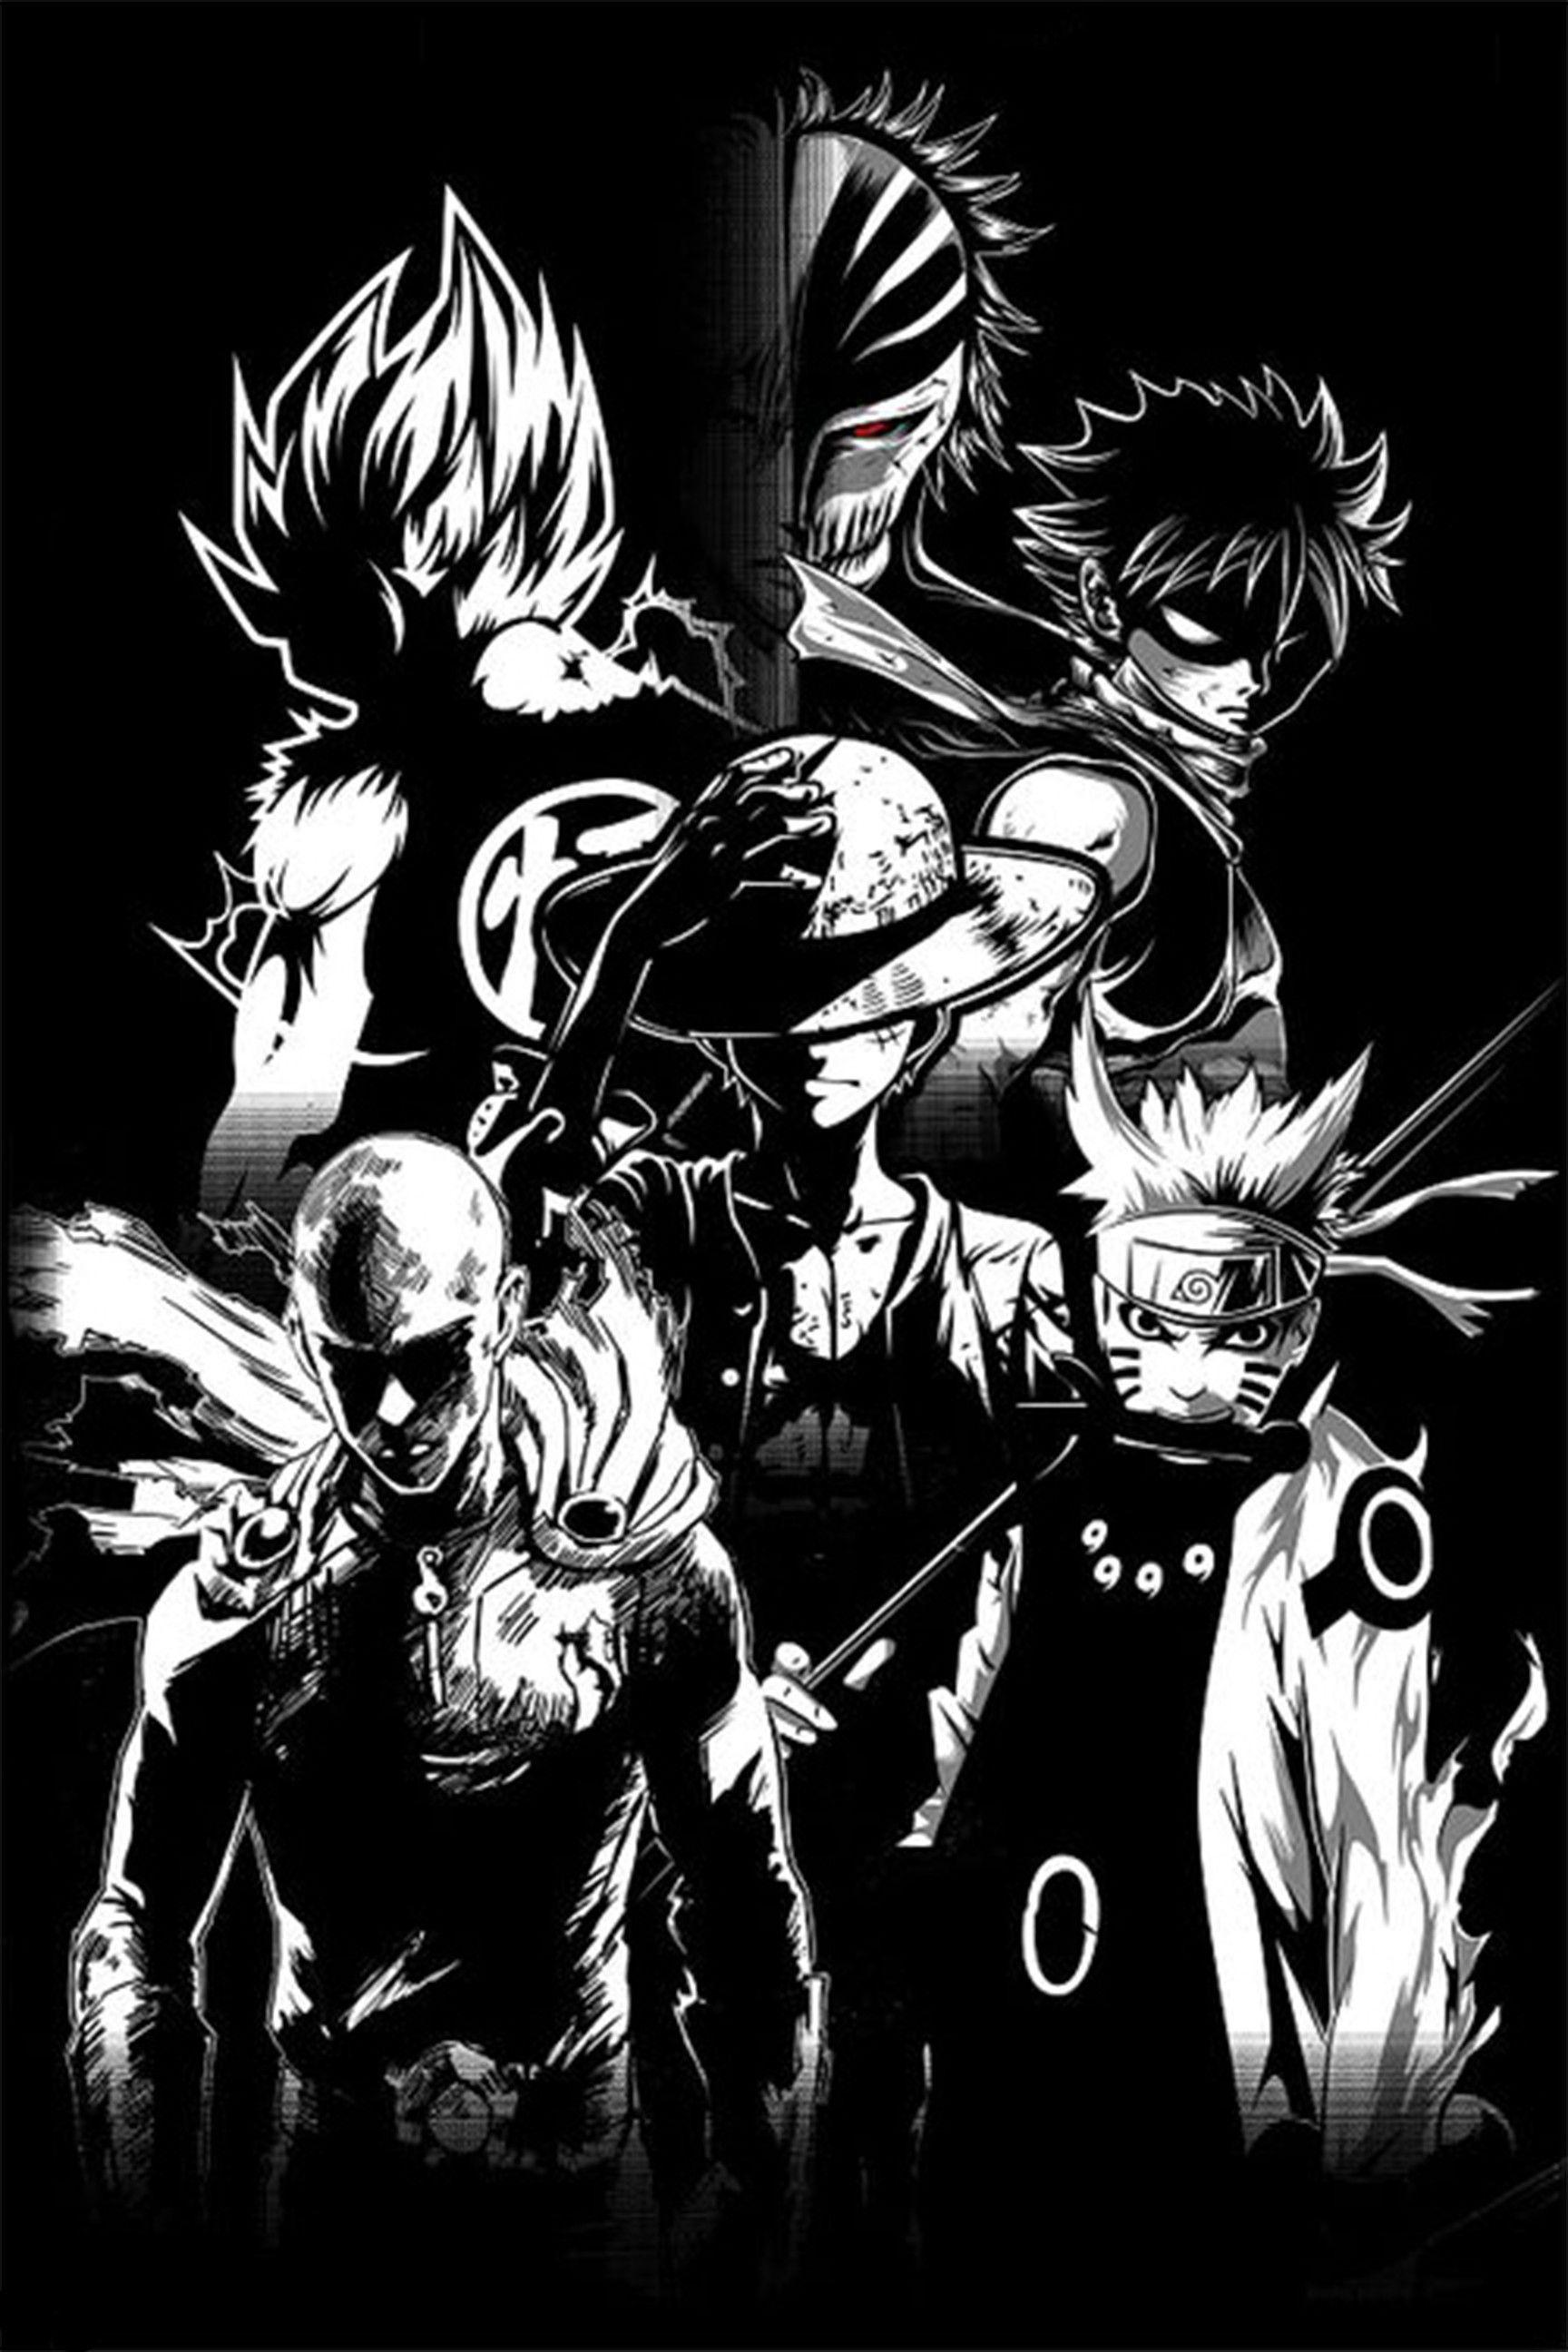 Badass Zoro Iphone Wallpaper In 2020 Anime Anime Crossover Naruto Shippuden Anime